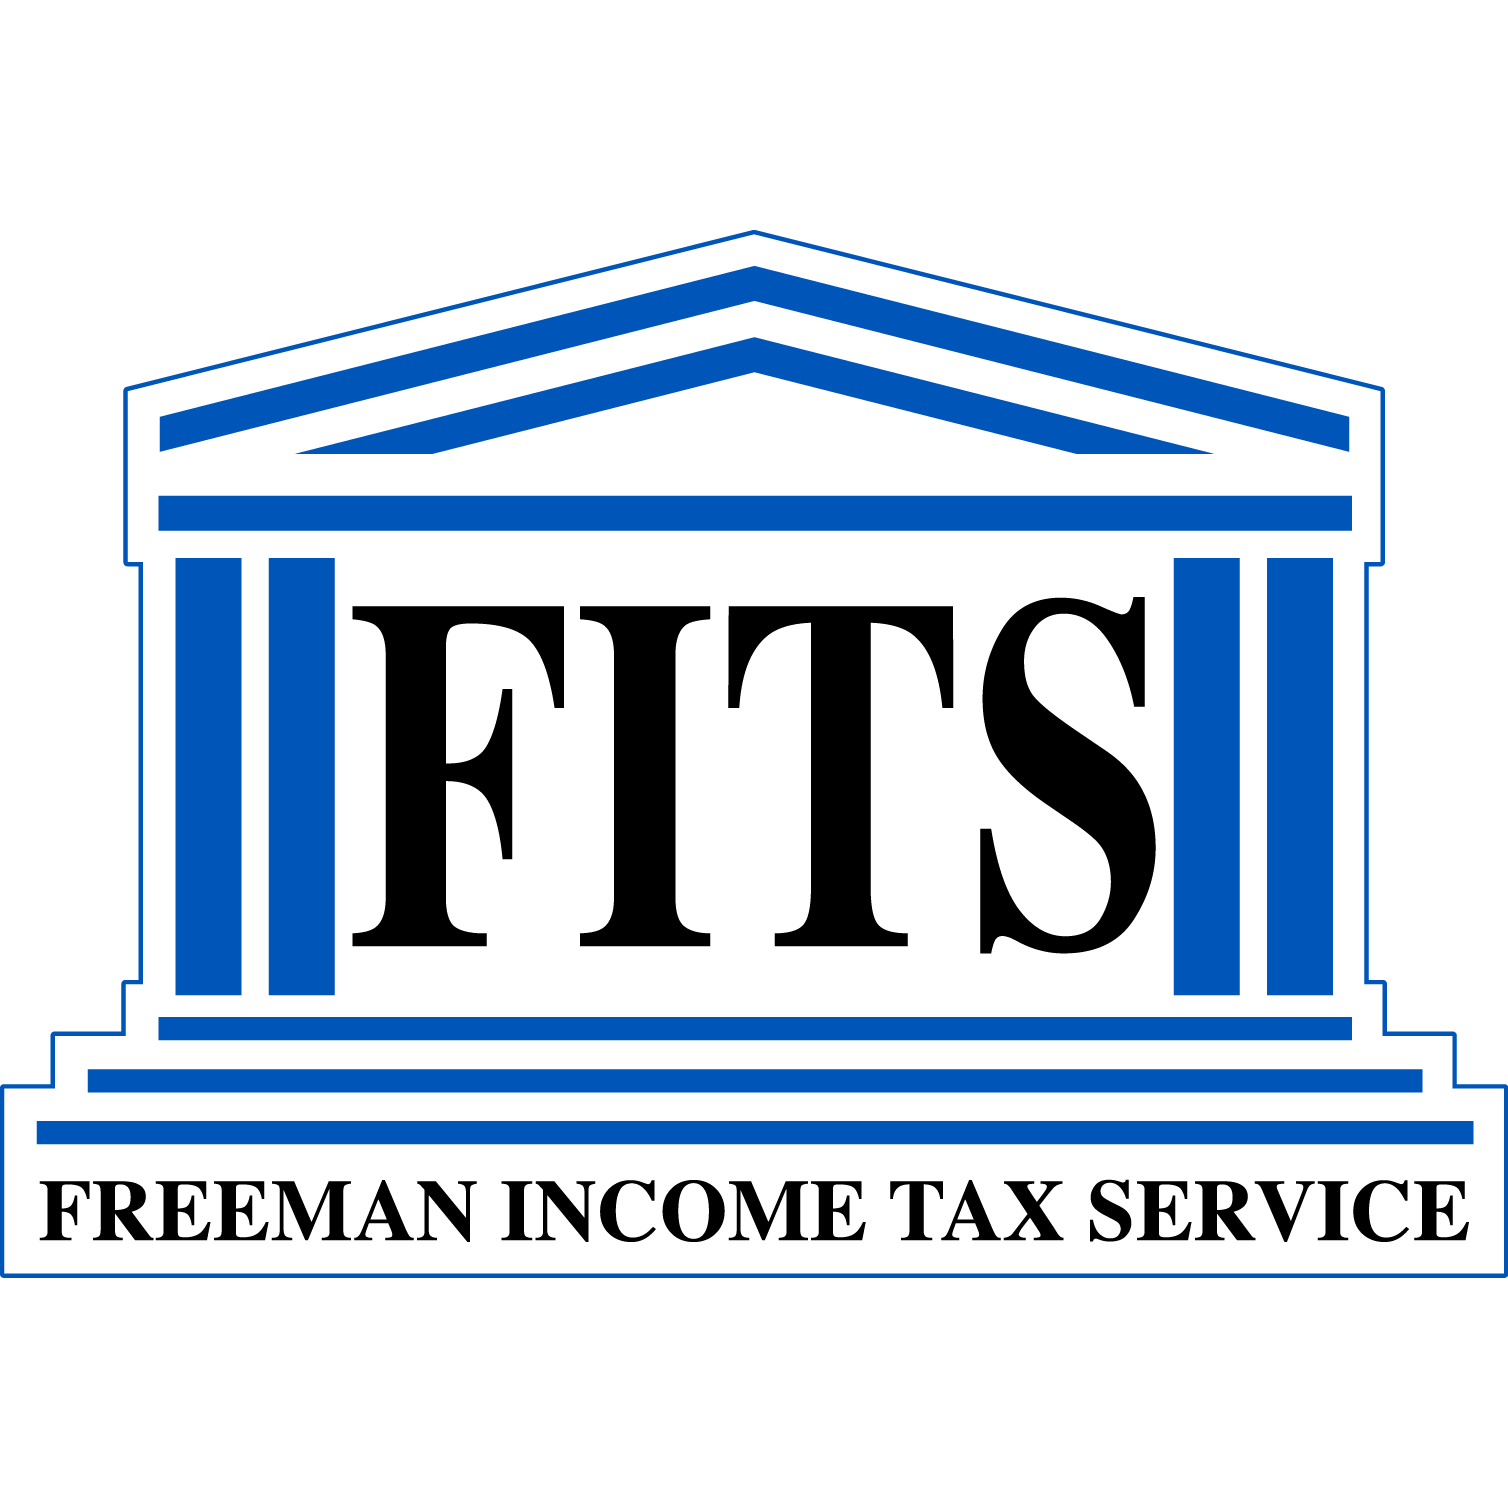 Freeman Income Tax Service